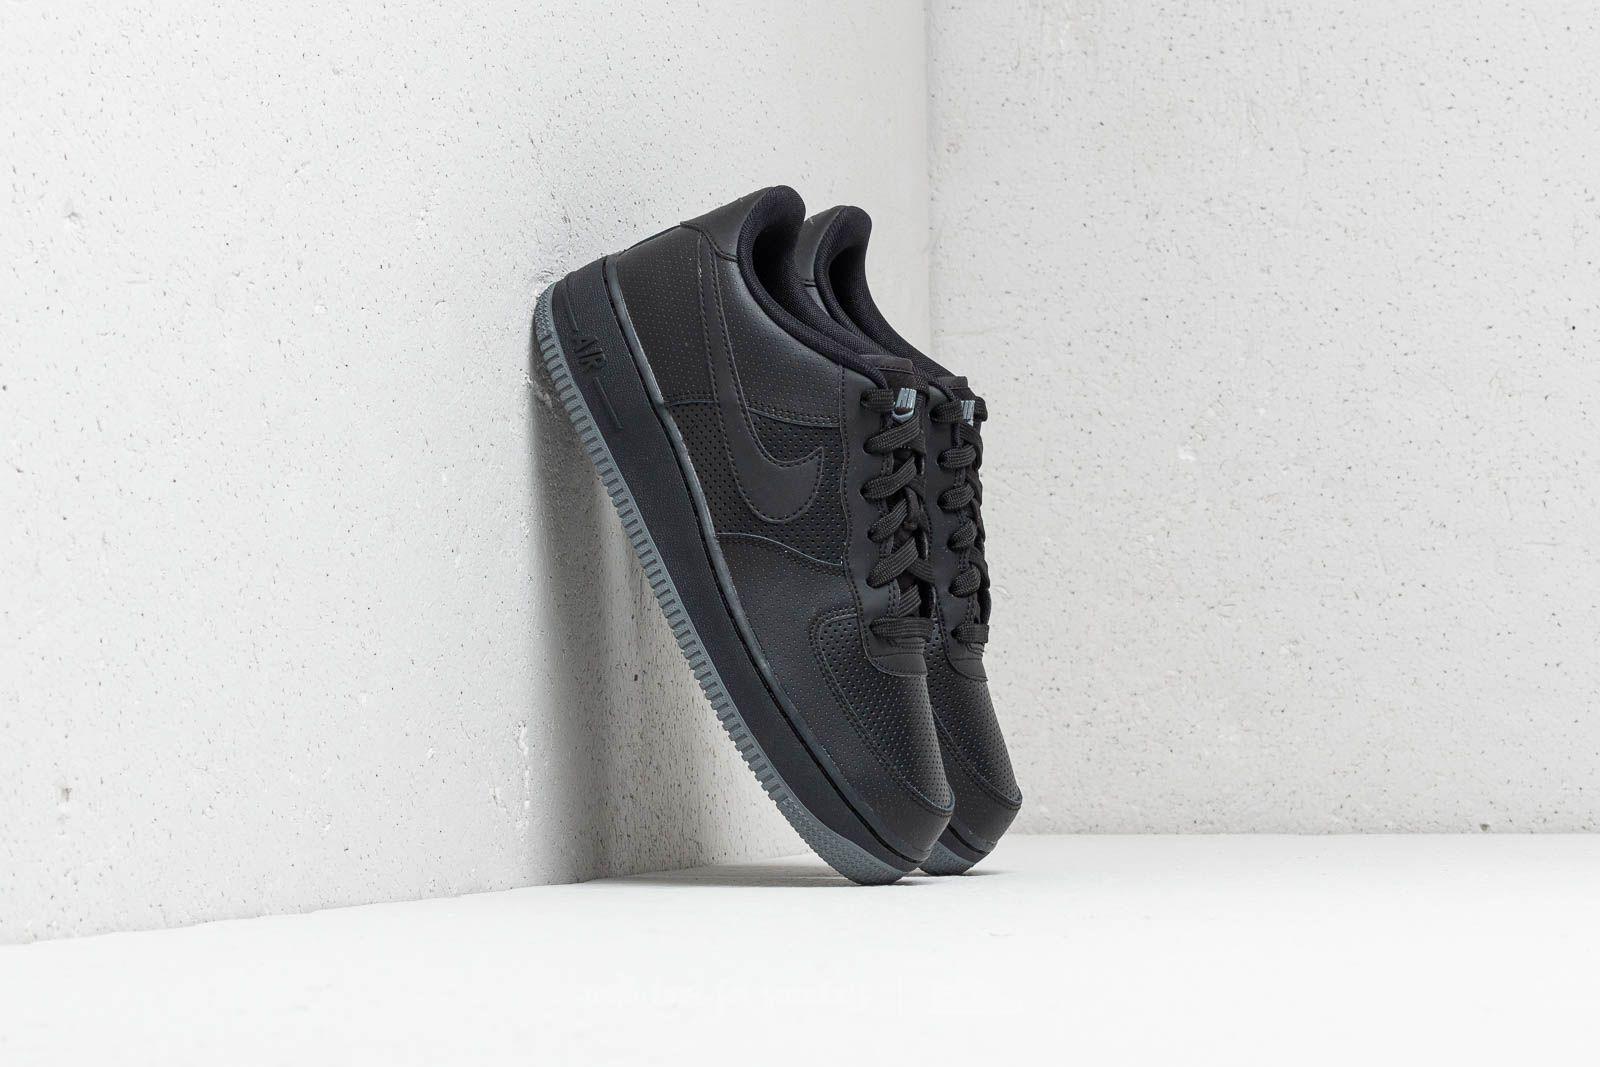 Nike Air Force 1 LV8 Perf (GS) Black/ Black-Dark Grey za skvělou cenu 2 390 Kč koupíte na Footshop.cz